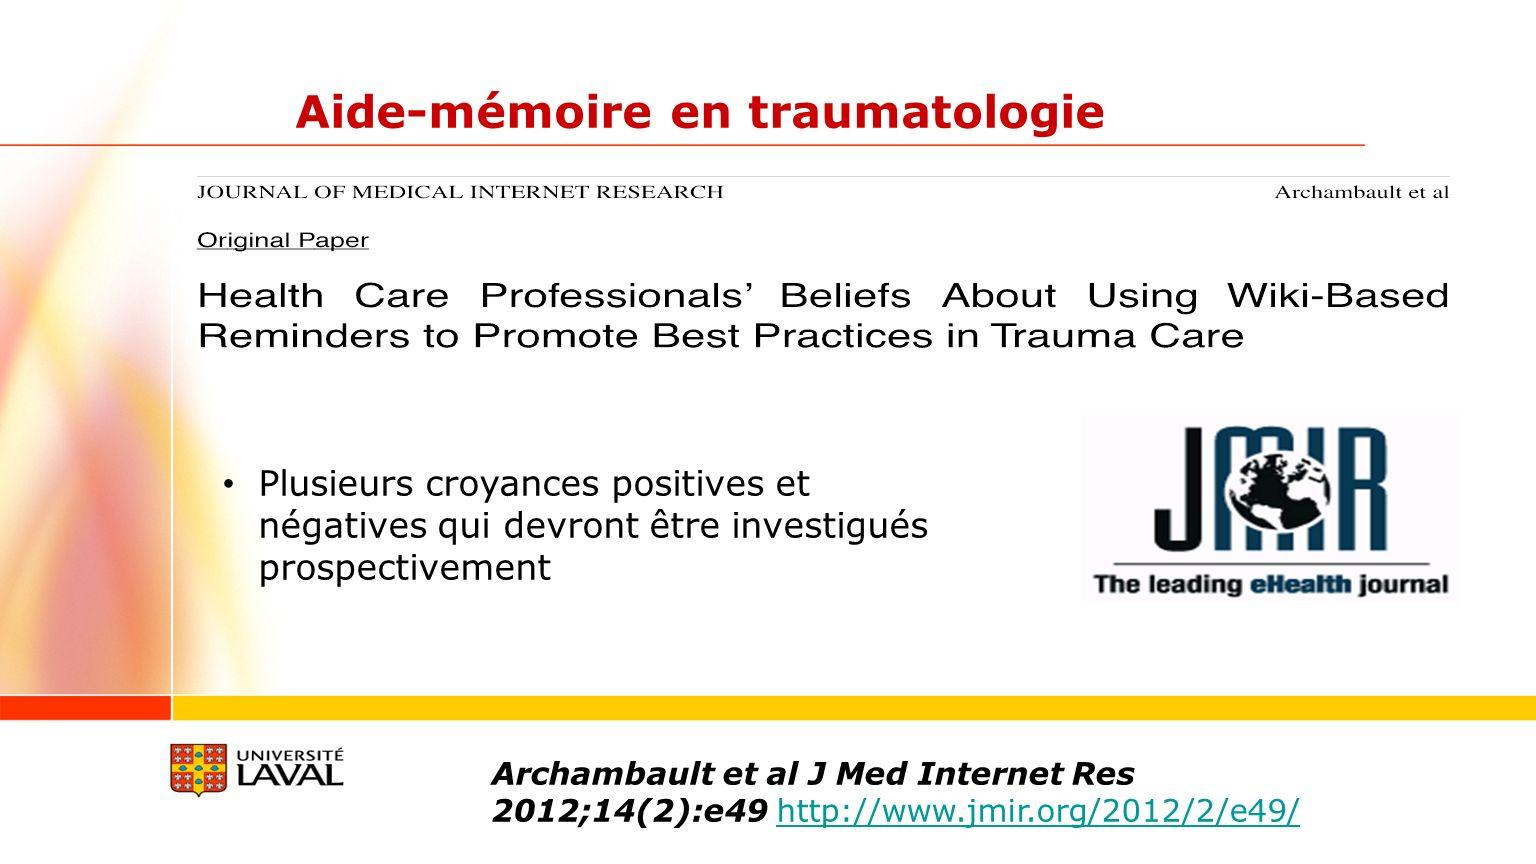 Aide-mémoire en traumatologie Archambault et al J Med Internet Res 2012;14(2):e49 http://www.jmir.org/2012/2/e49/http://www.jmir.org/2012/2/e49/ Plusi